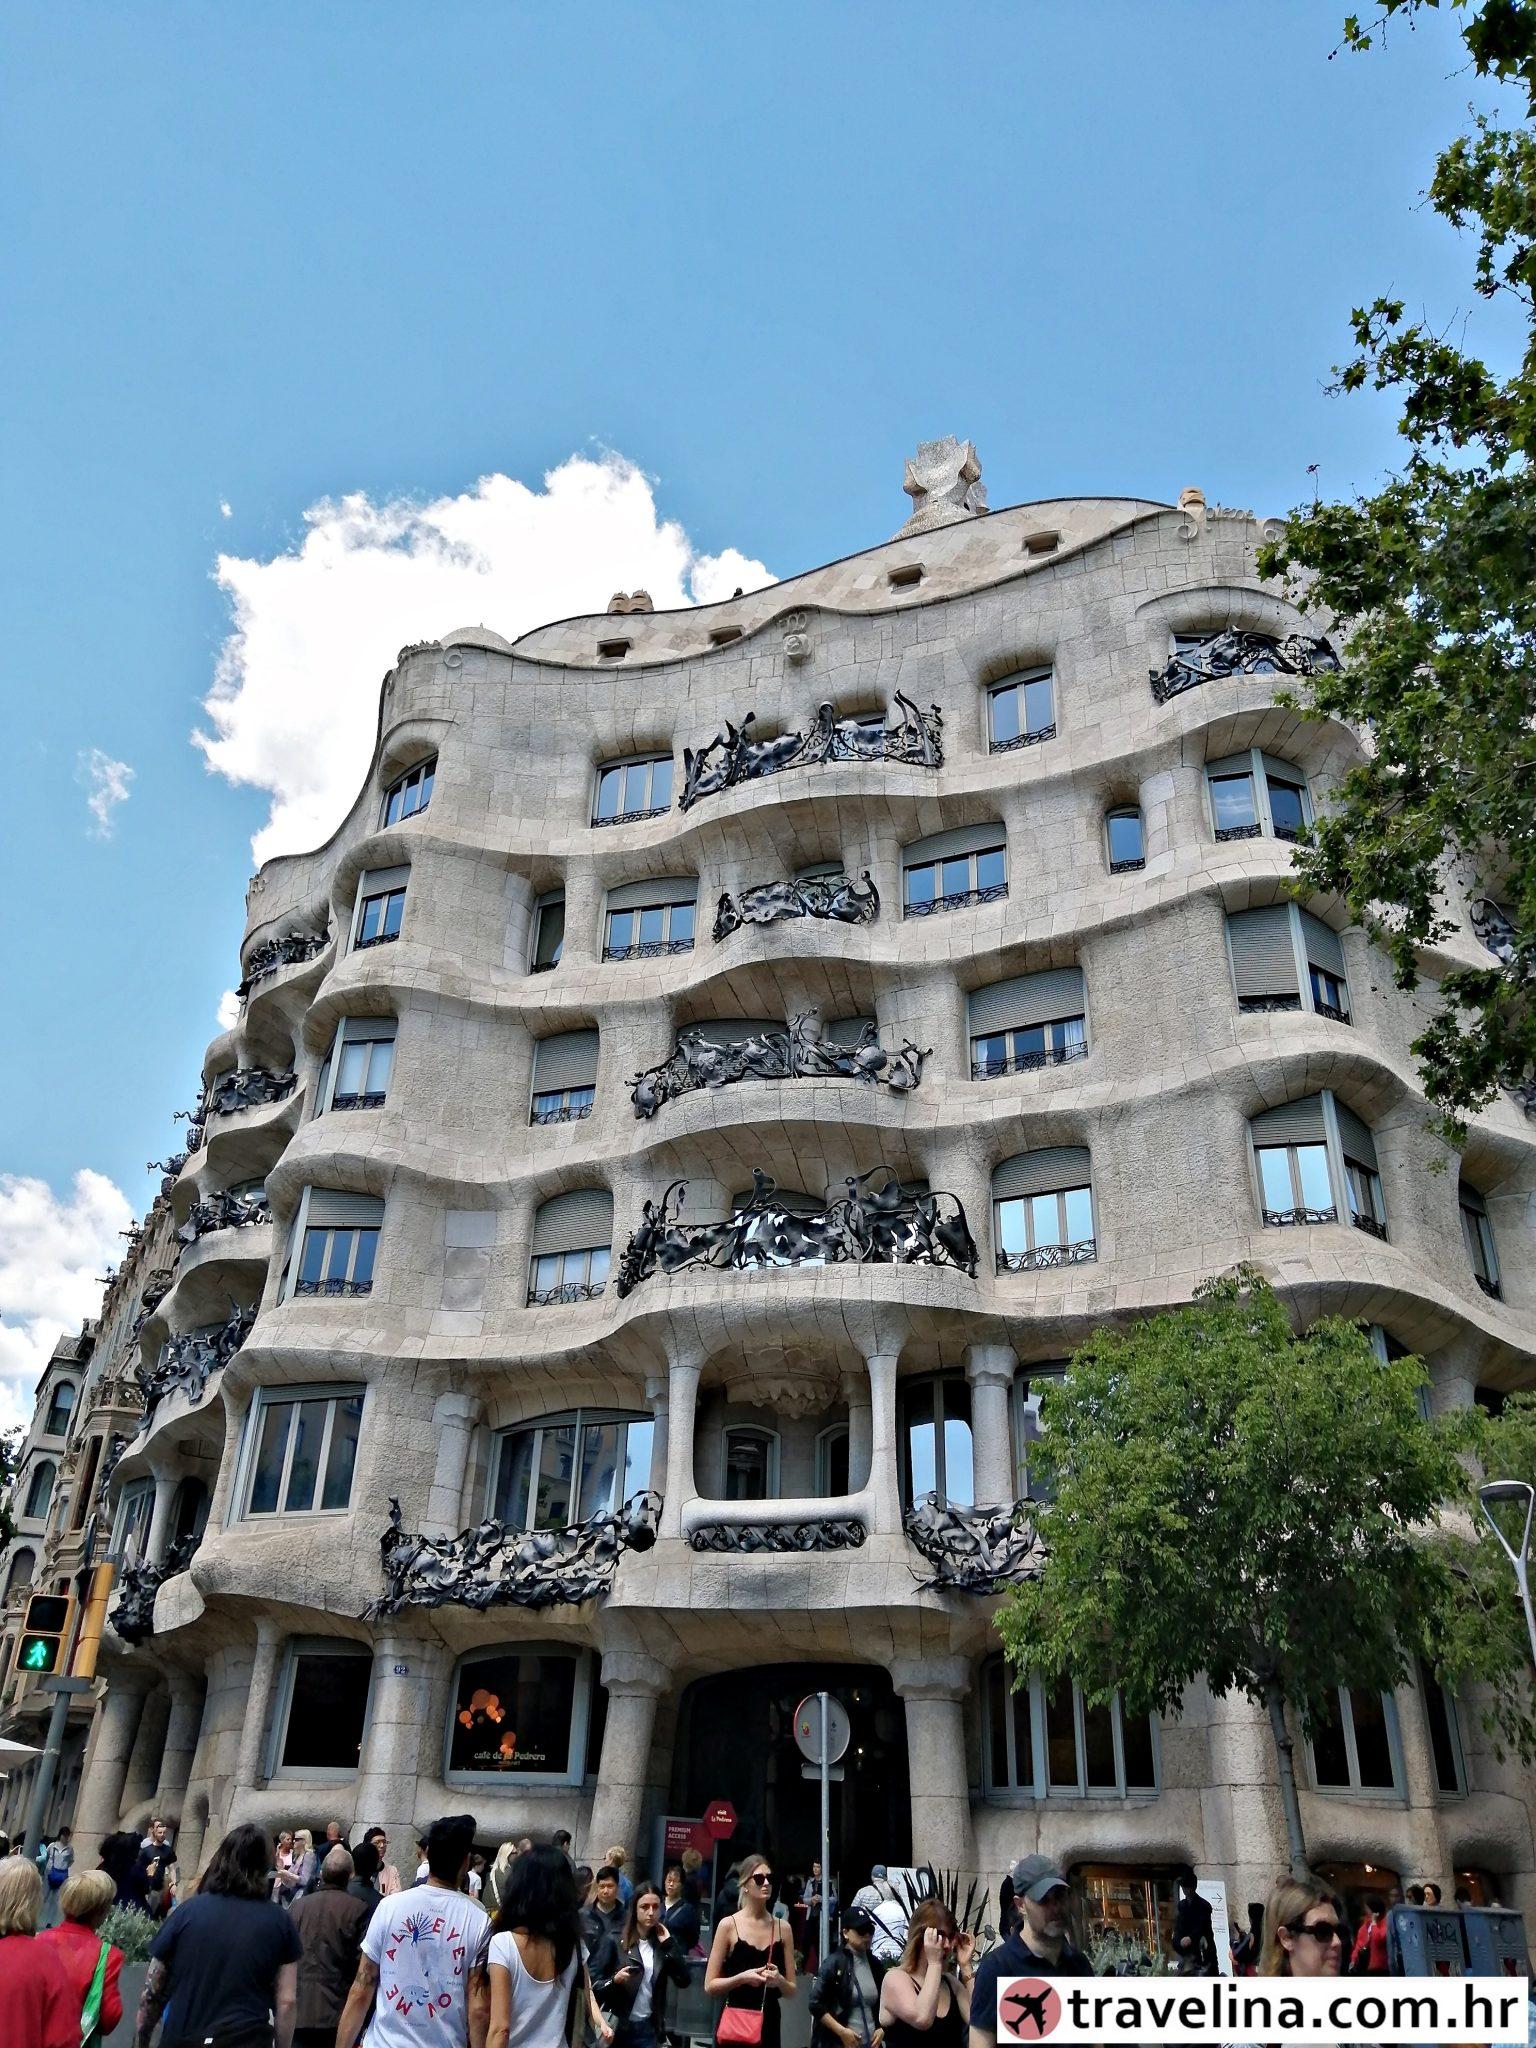 Casa Mila - Barcelona